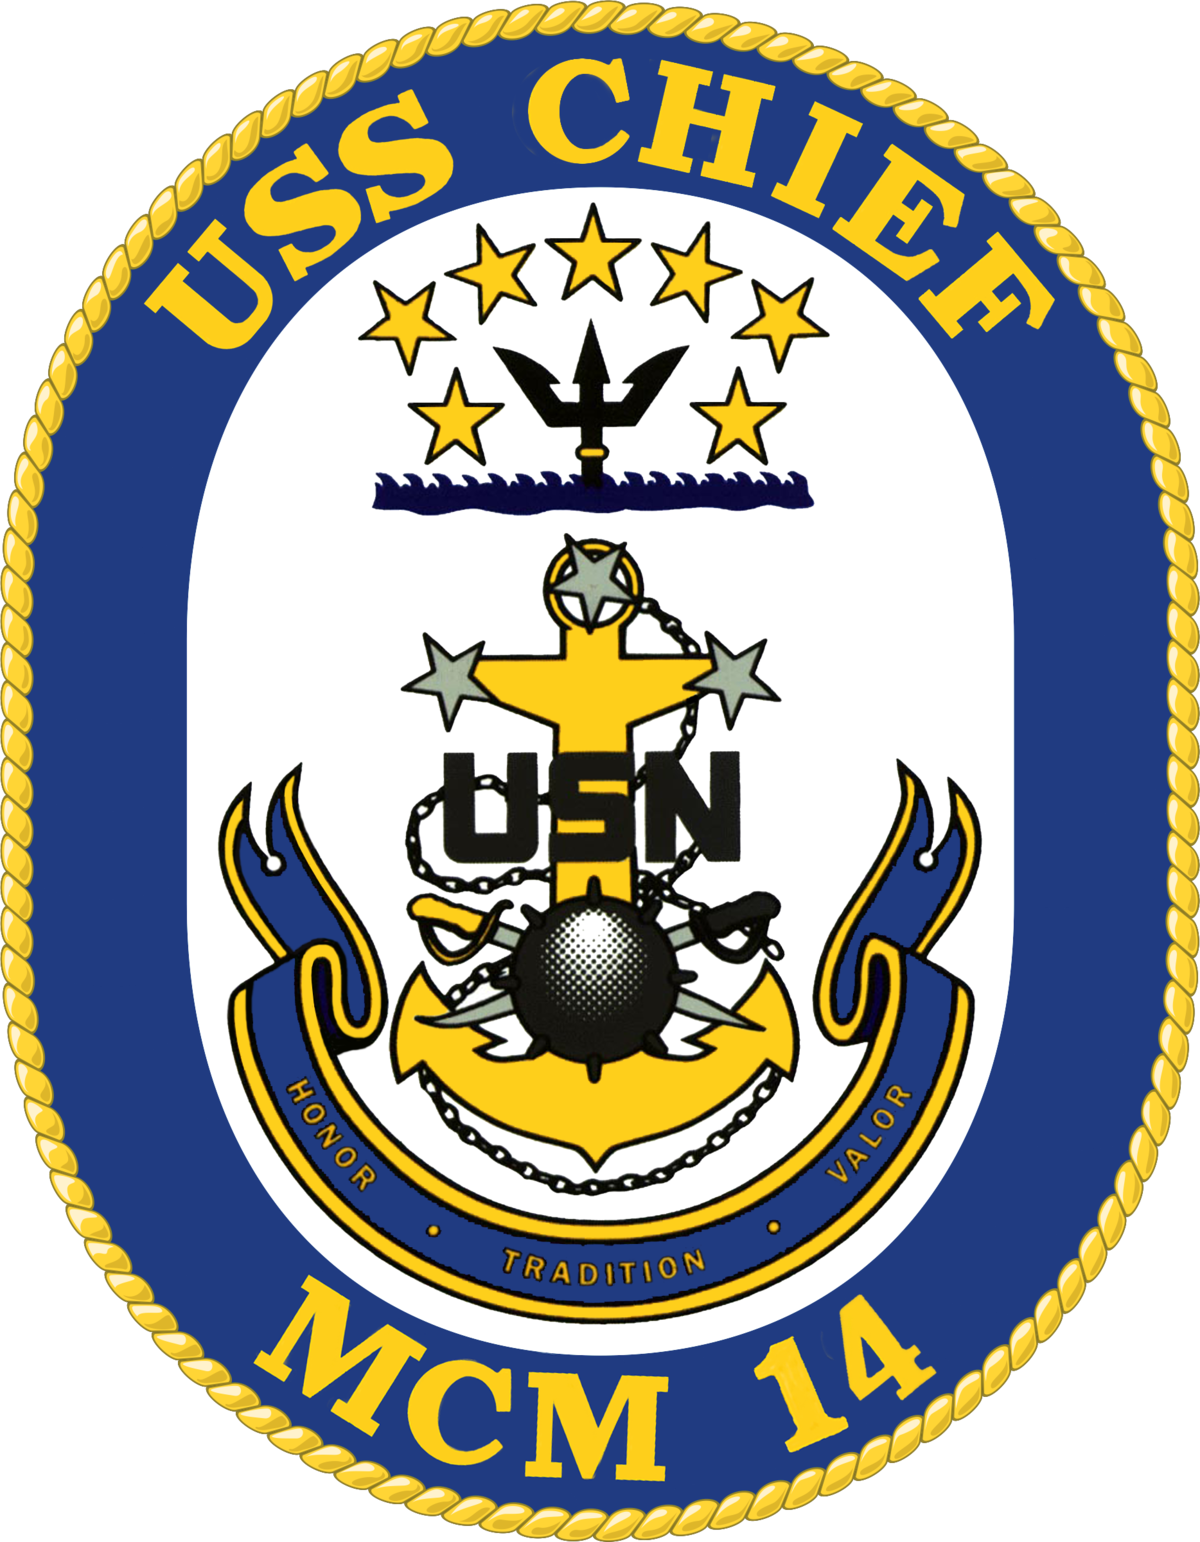 uss chief mcm 14 wikipedia